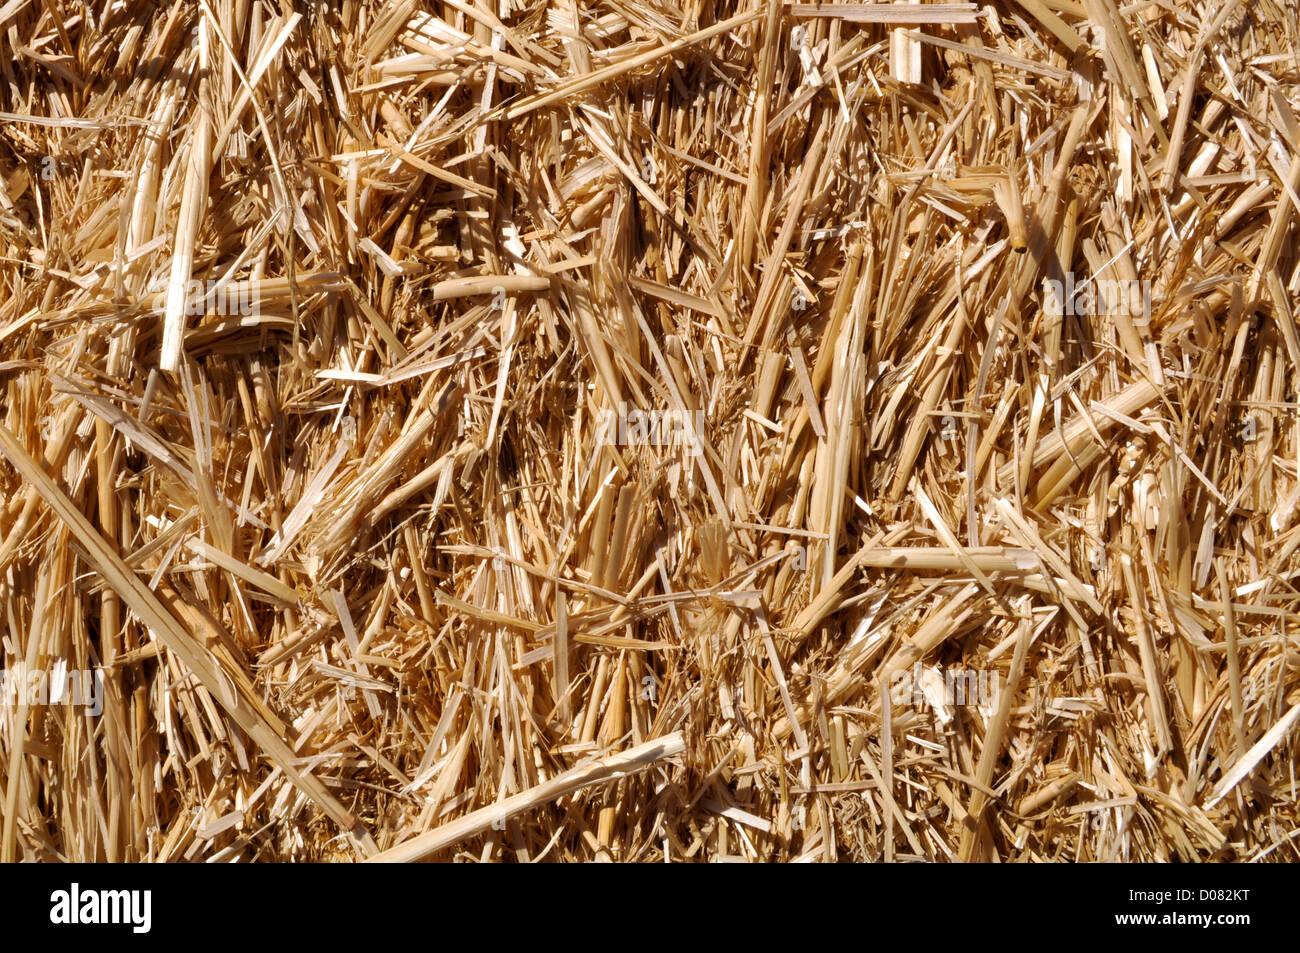 Straw Background - Stock Image